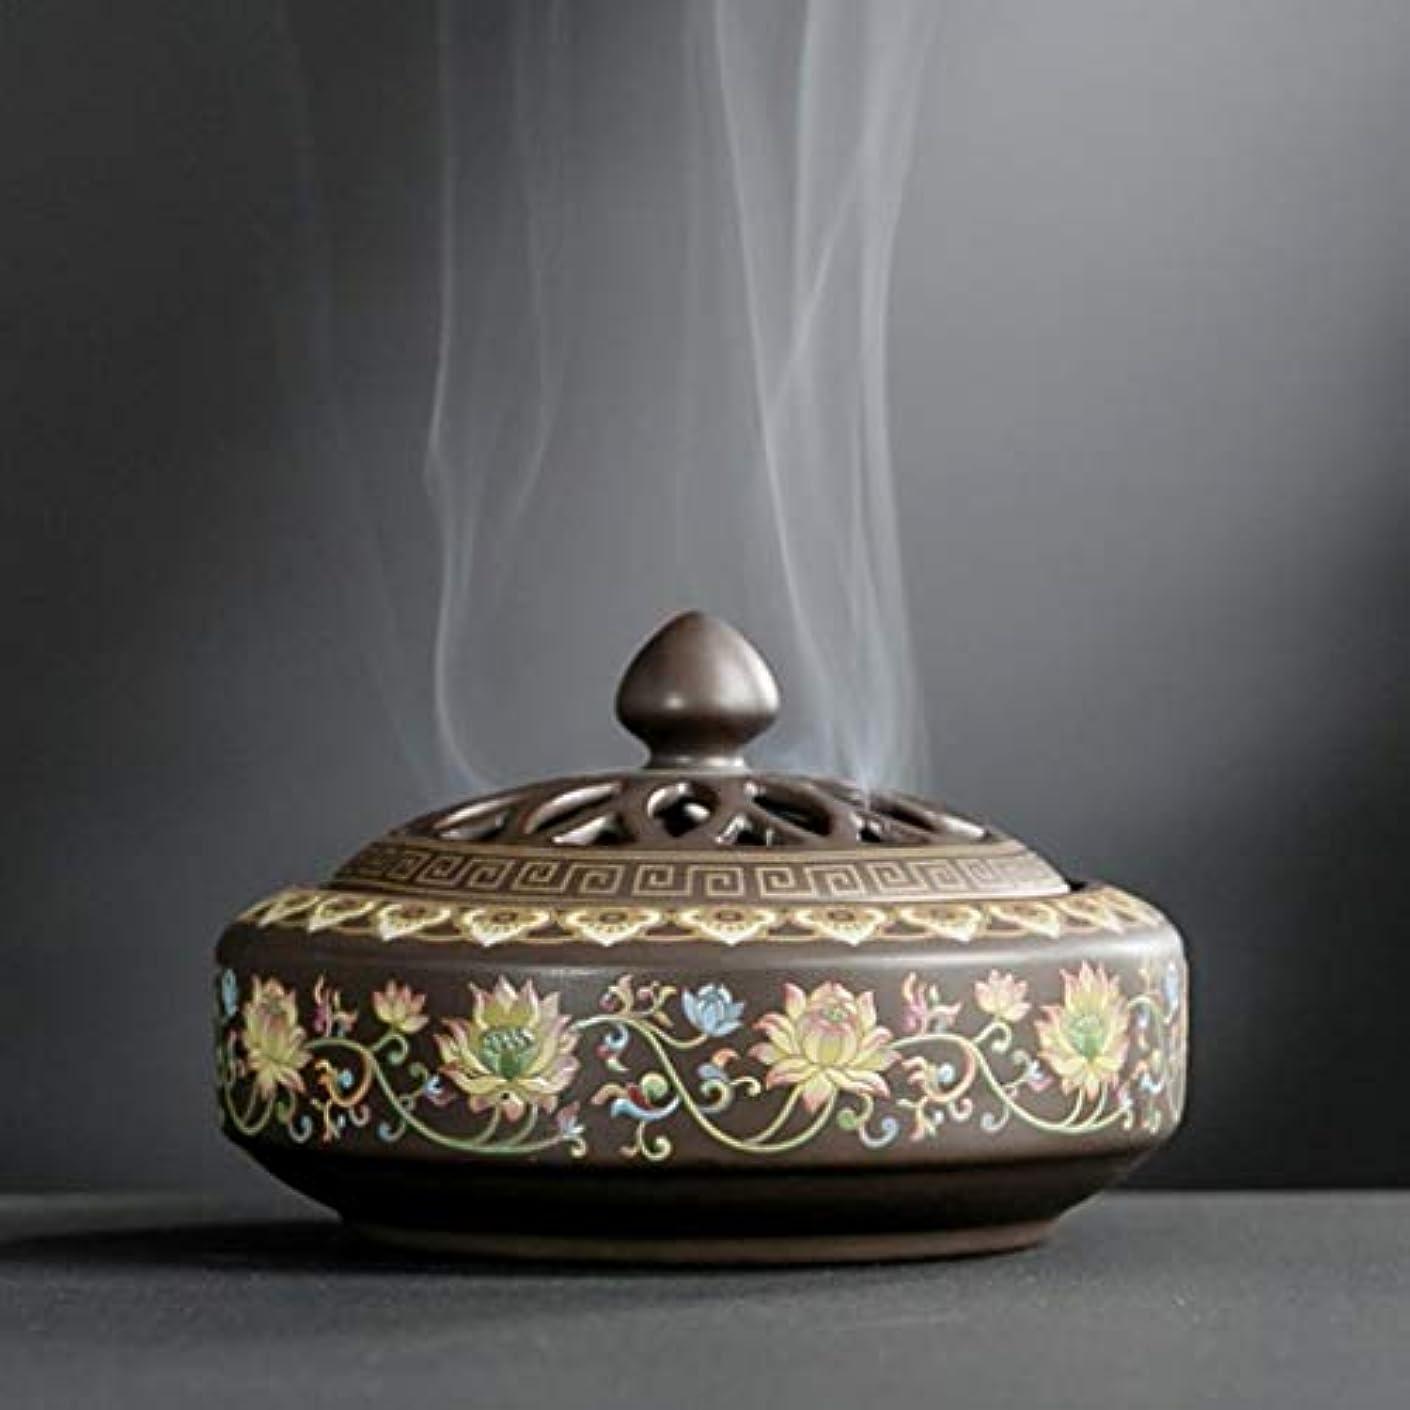 YONIK 香炉 渦巻き線香ホルダー 蚊取り線香ホルダー 線香入れ 磁器 香皿 蓋付き 難燃綿付き 和風